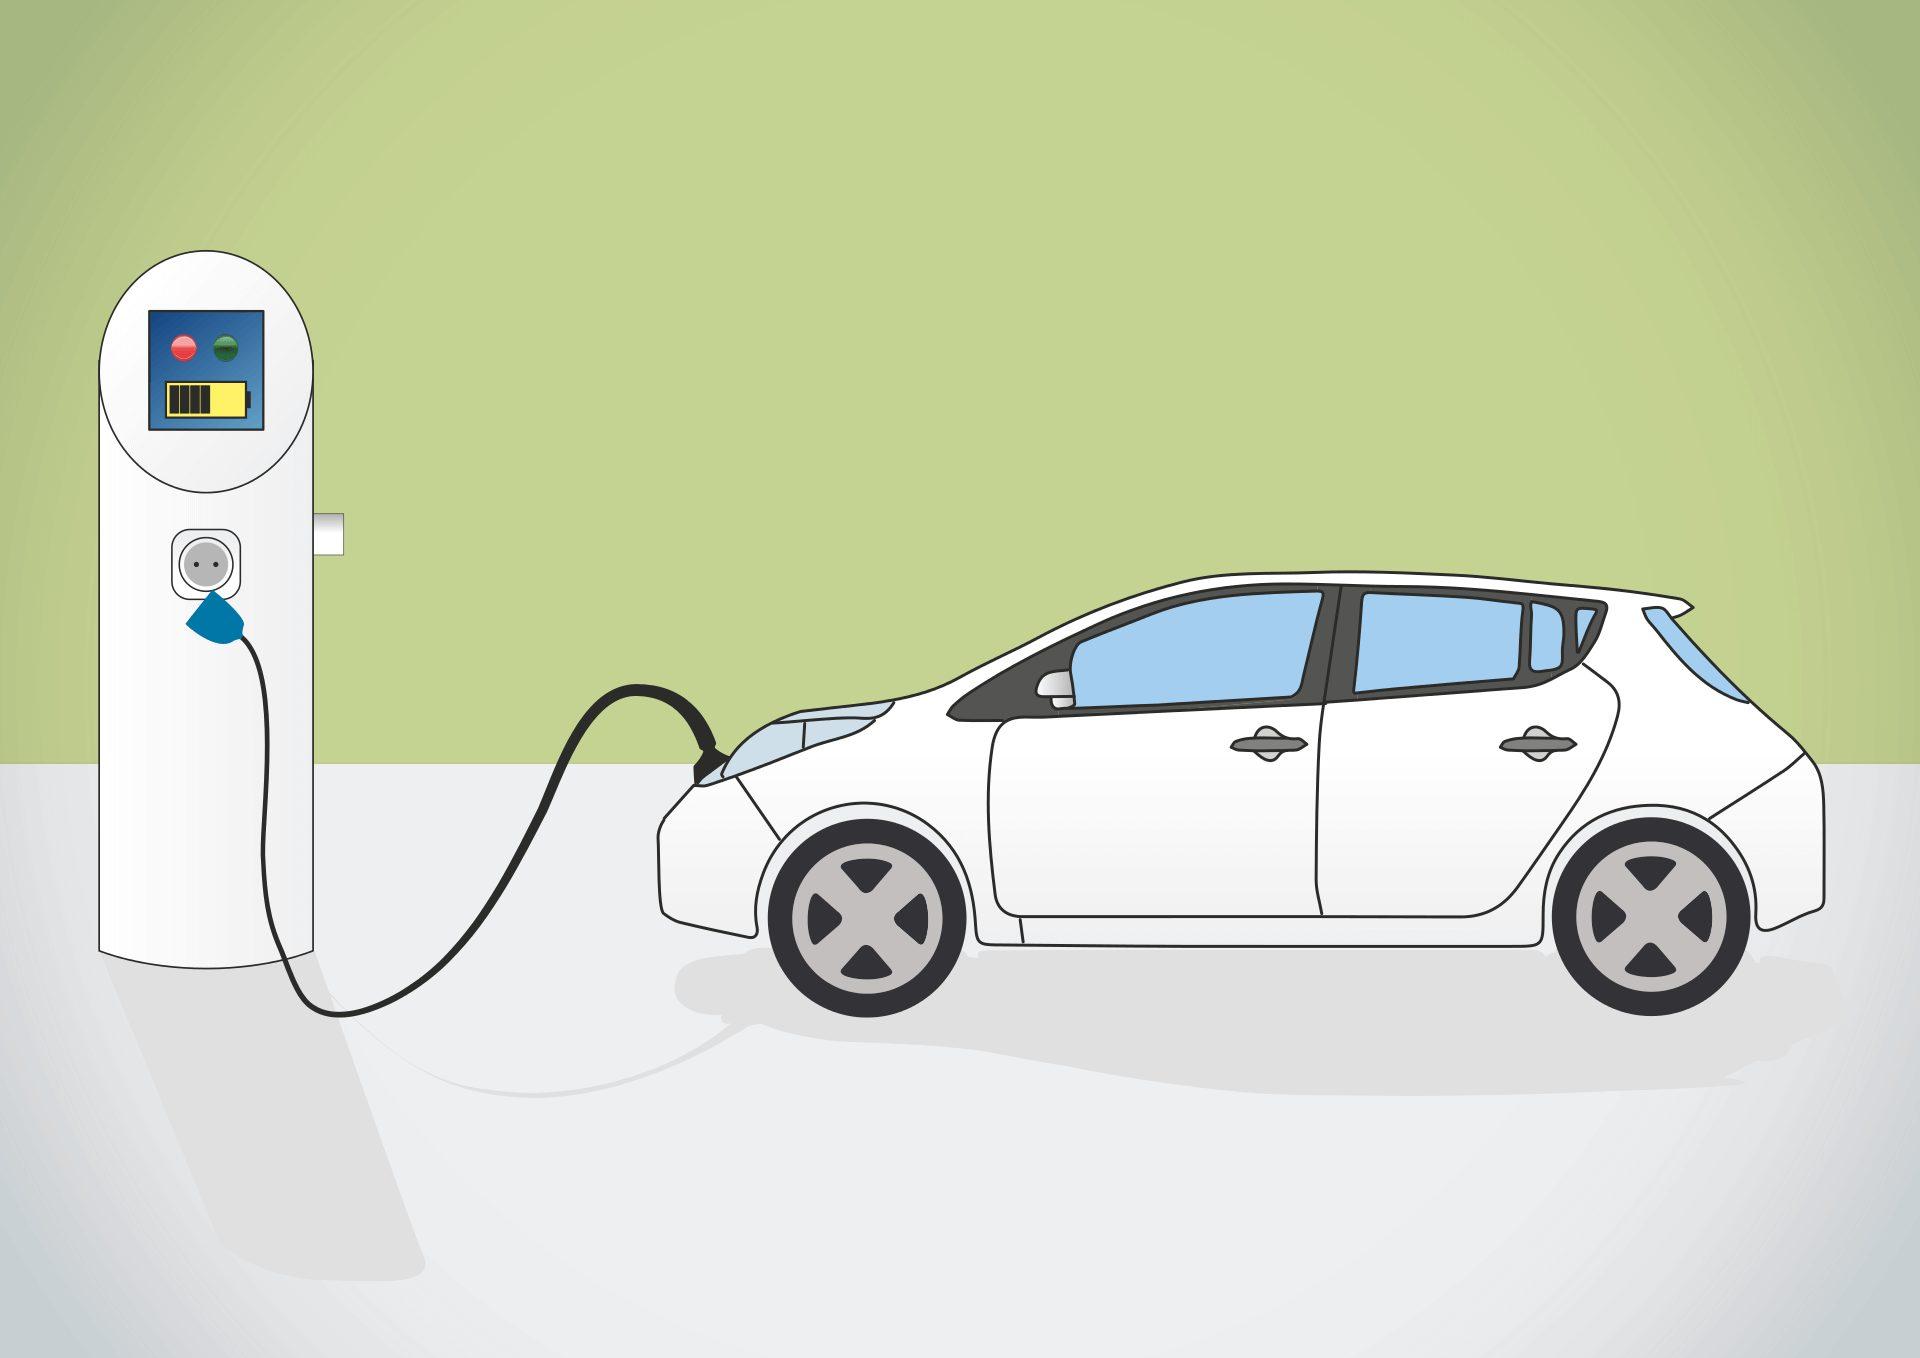 Govt mulls installing EV charging kiosks at around 69,000 petrol pumps